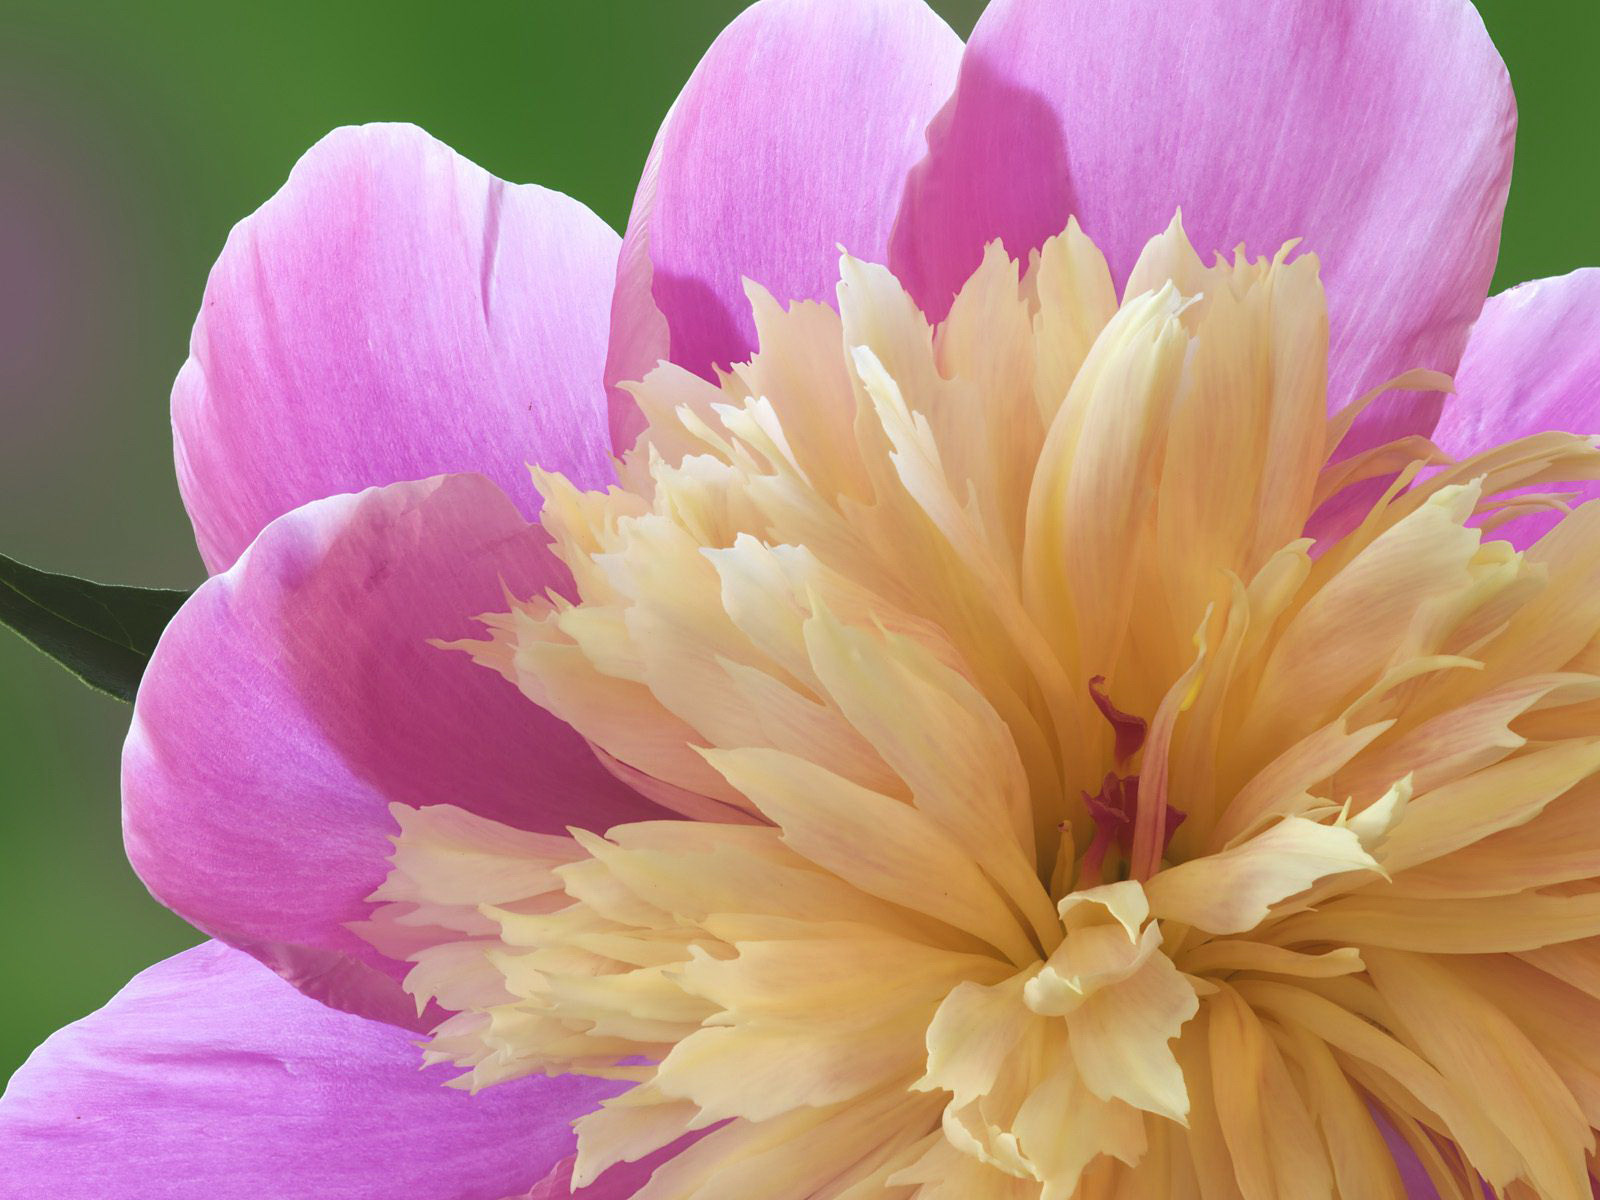 Elegant Flowers 22066 1920x1080 px